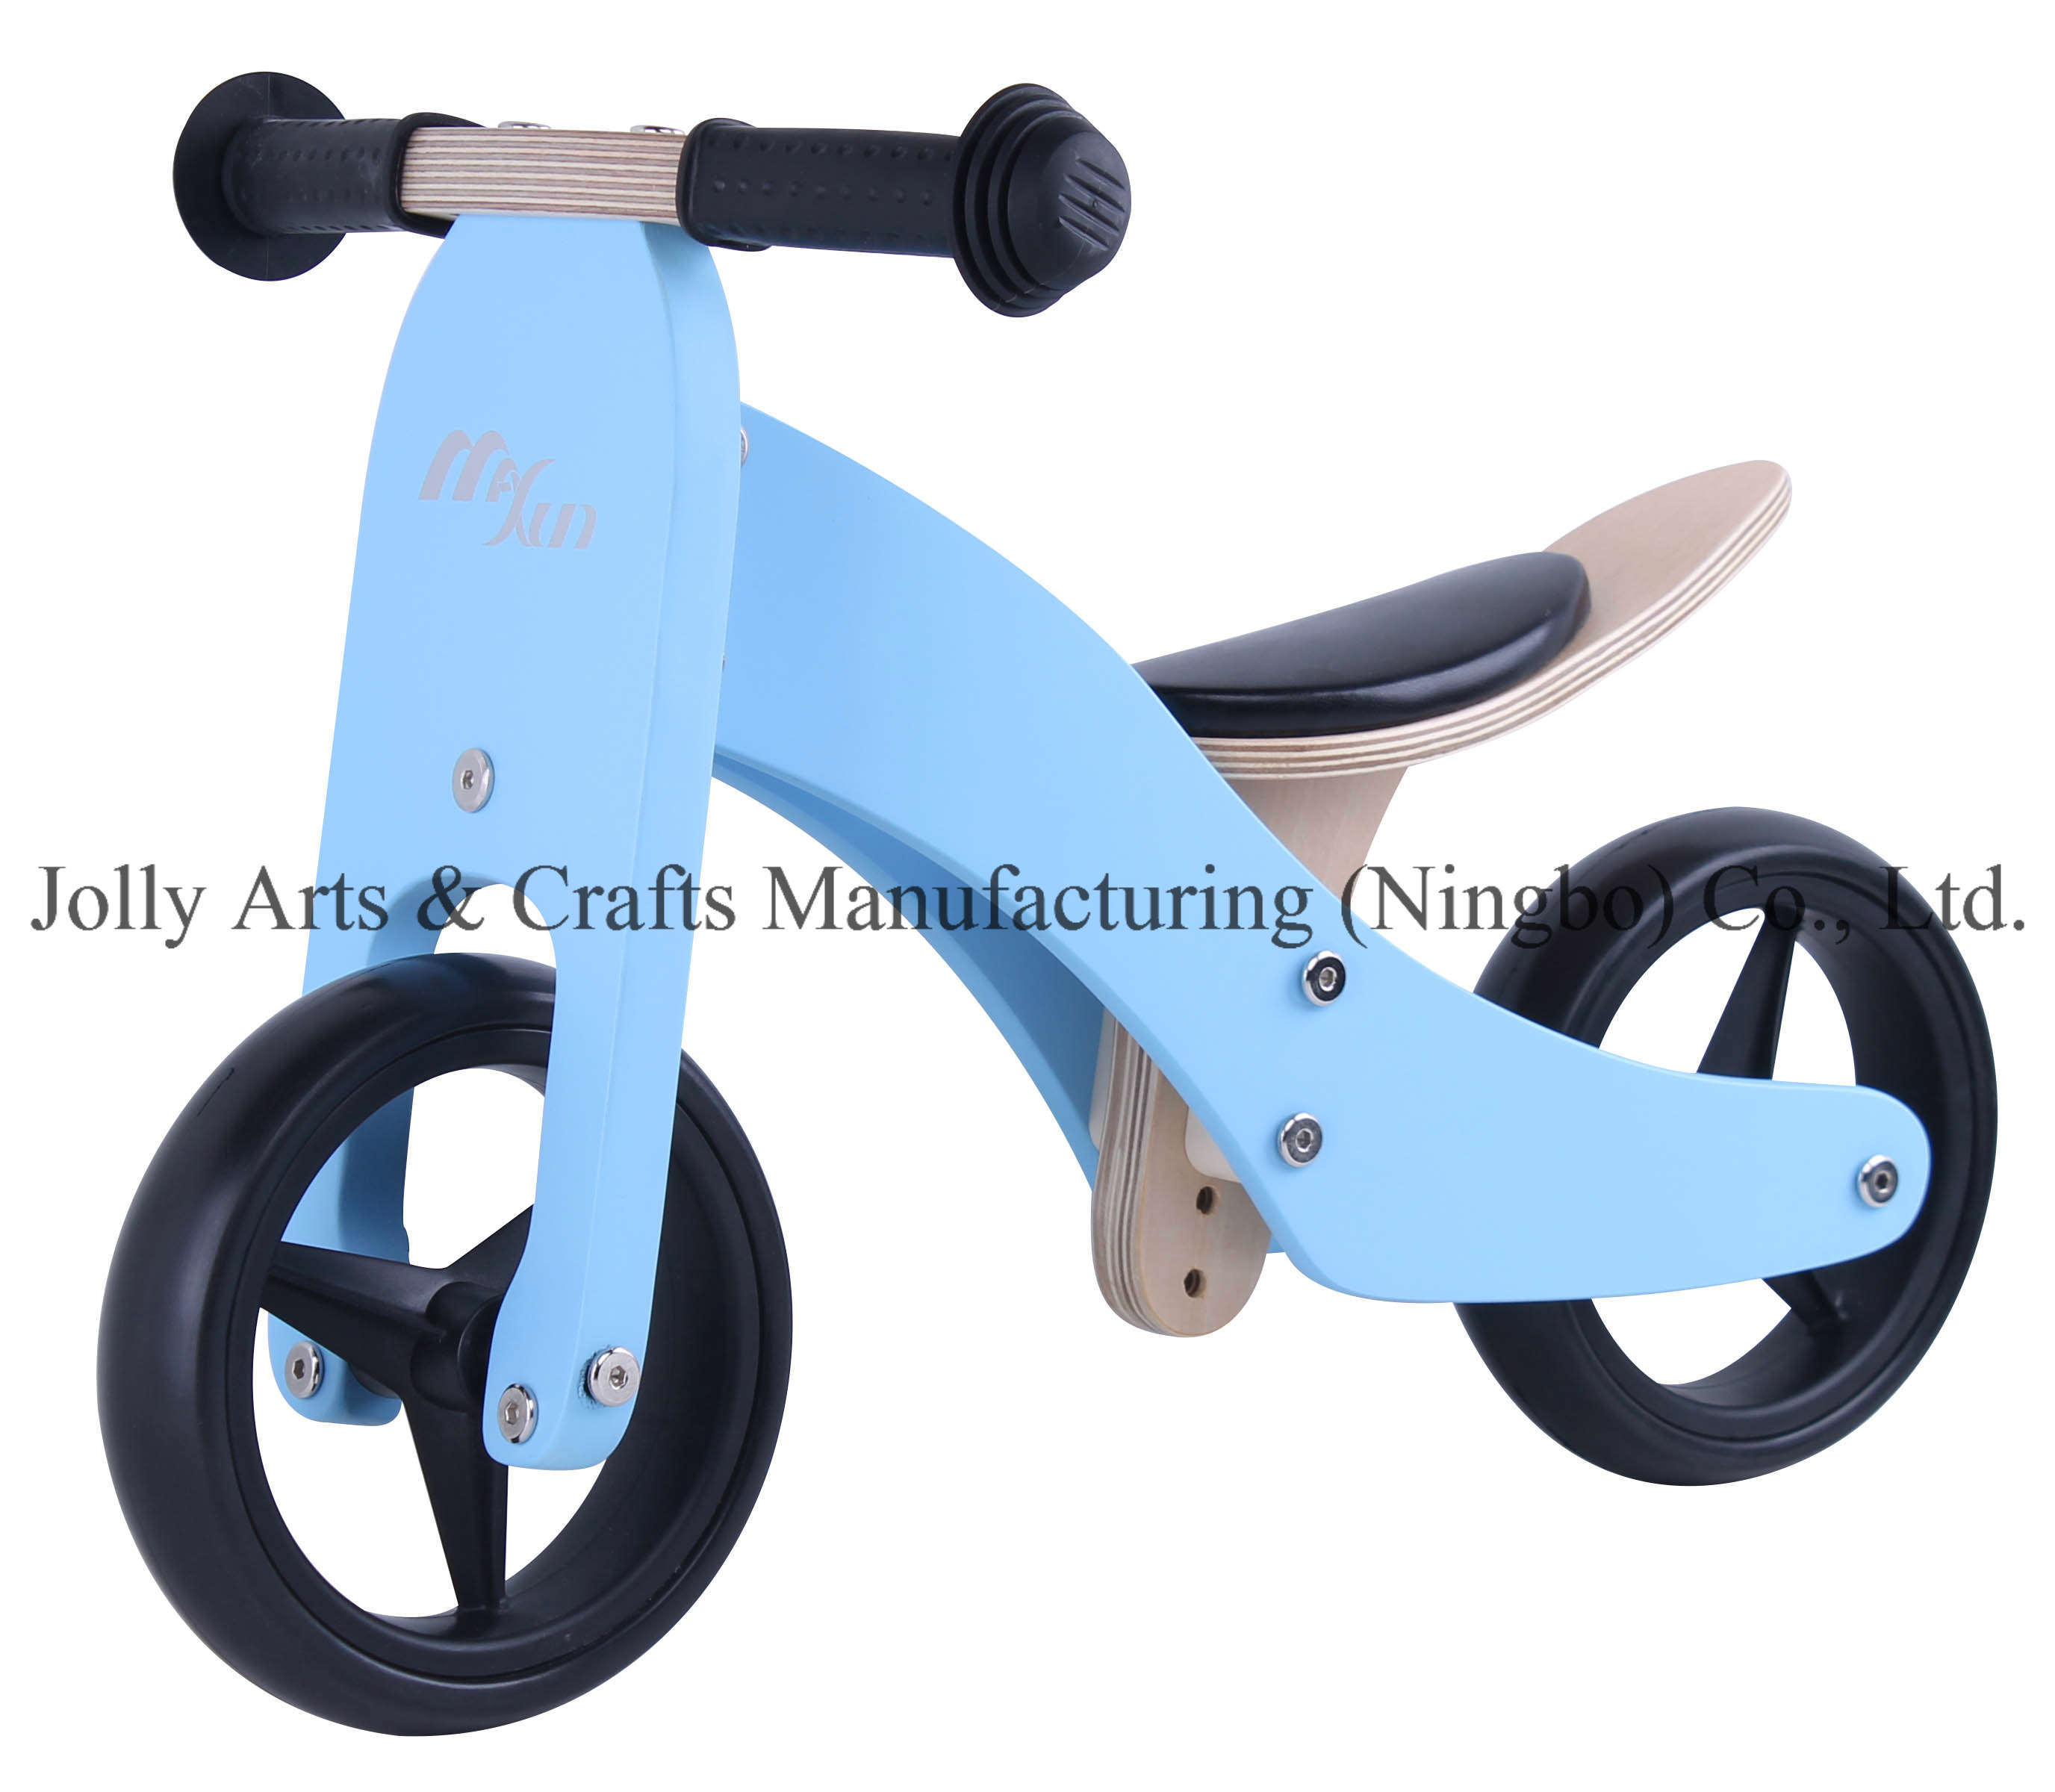 2017 Wholesale Wooden Balance Mini Bike 2 in 1for Toddlers, High Quality Wooden Balance Mini Bike for Toddlers